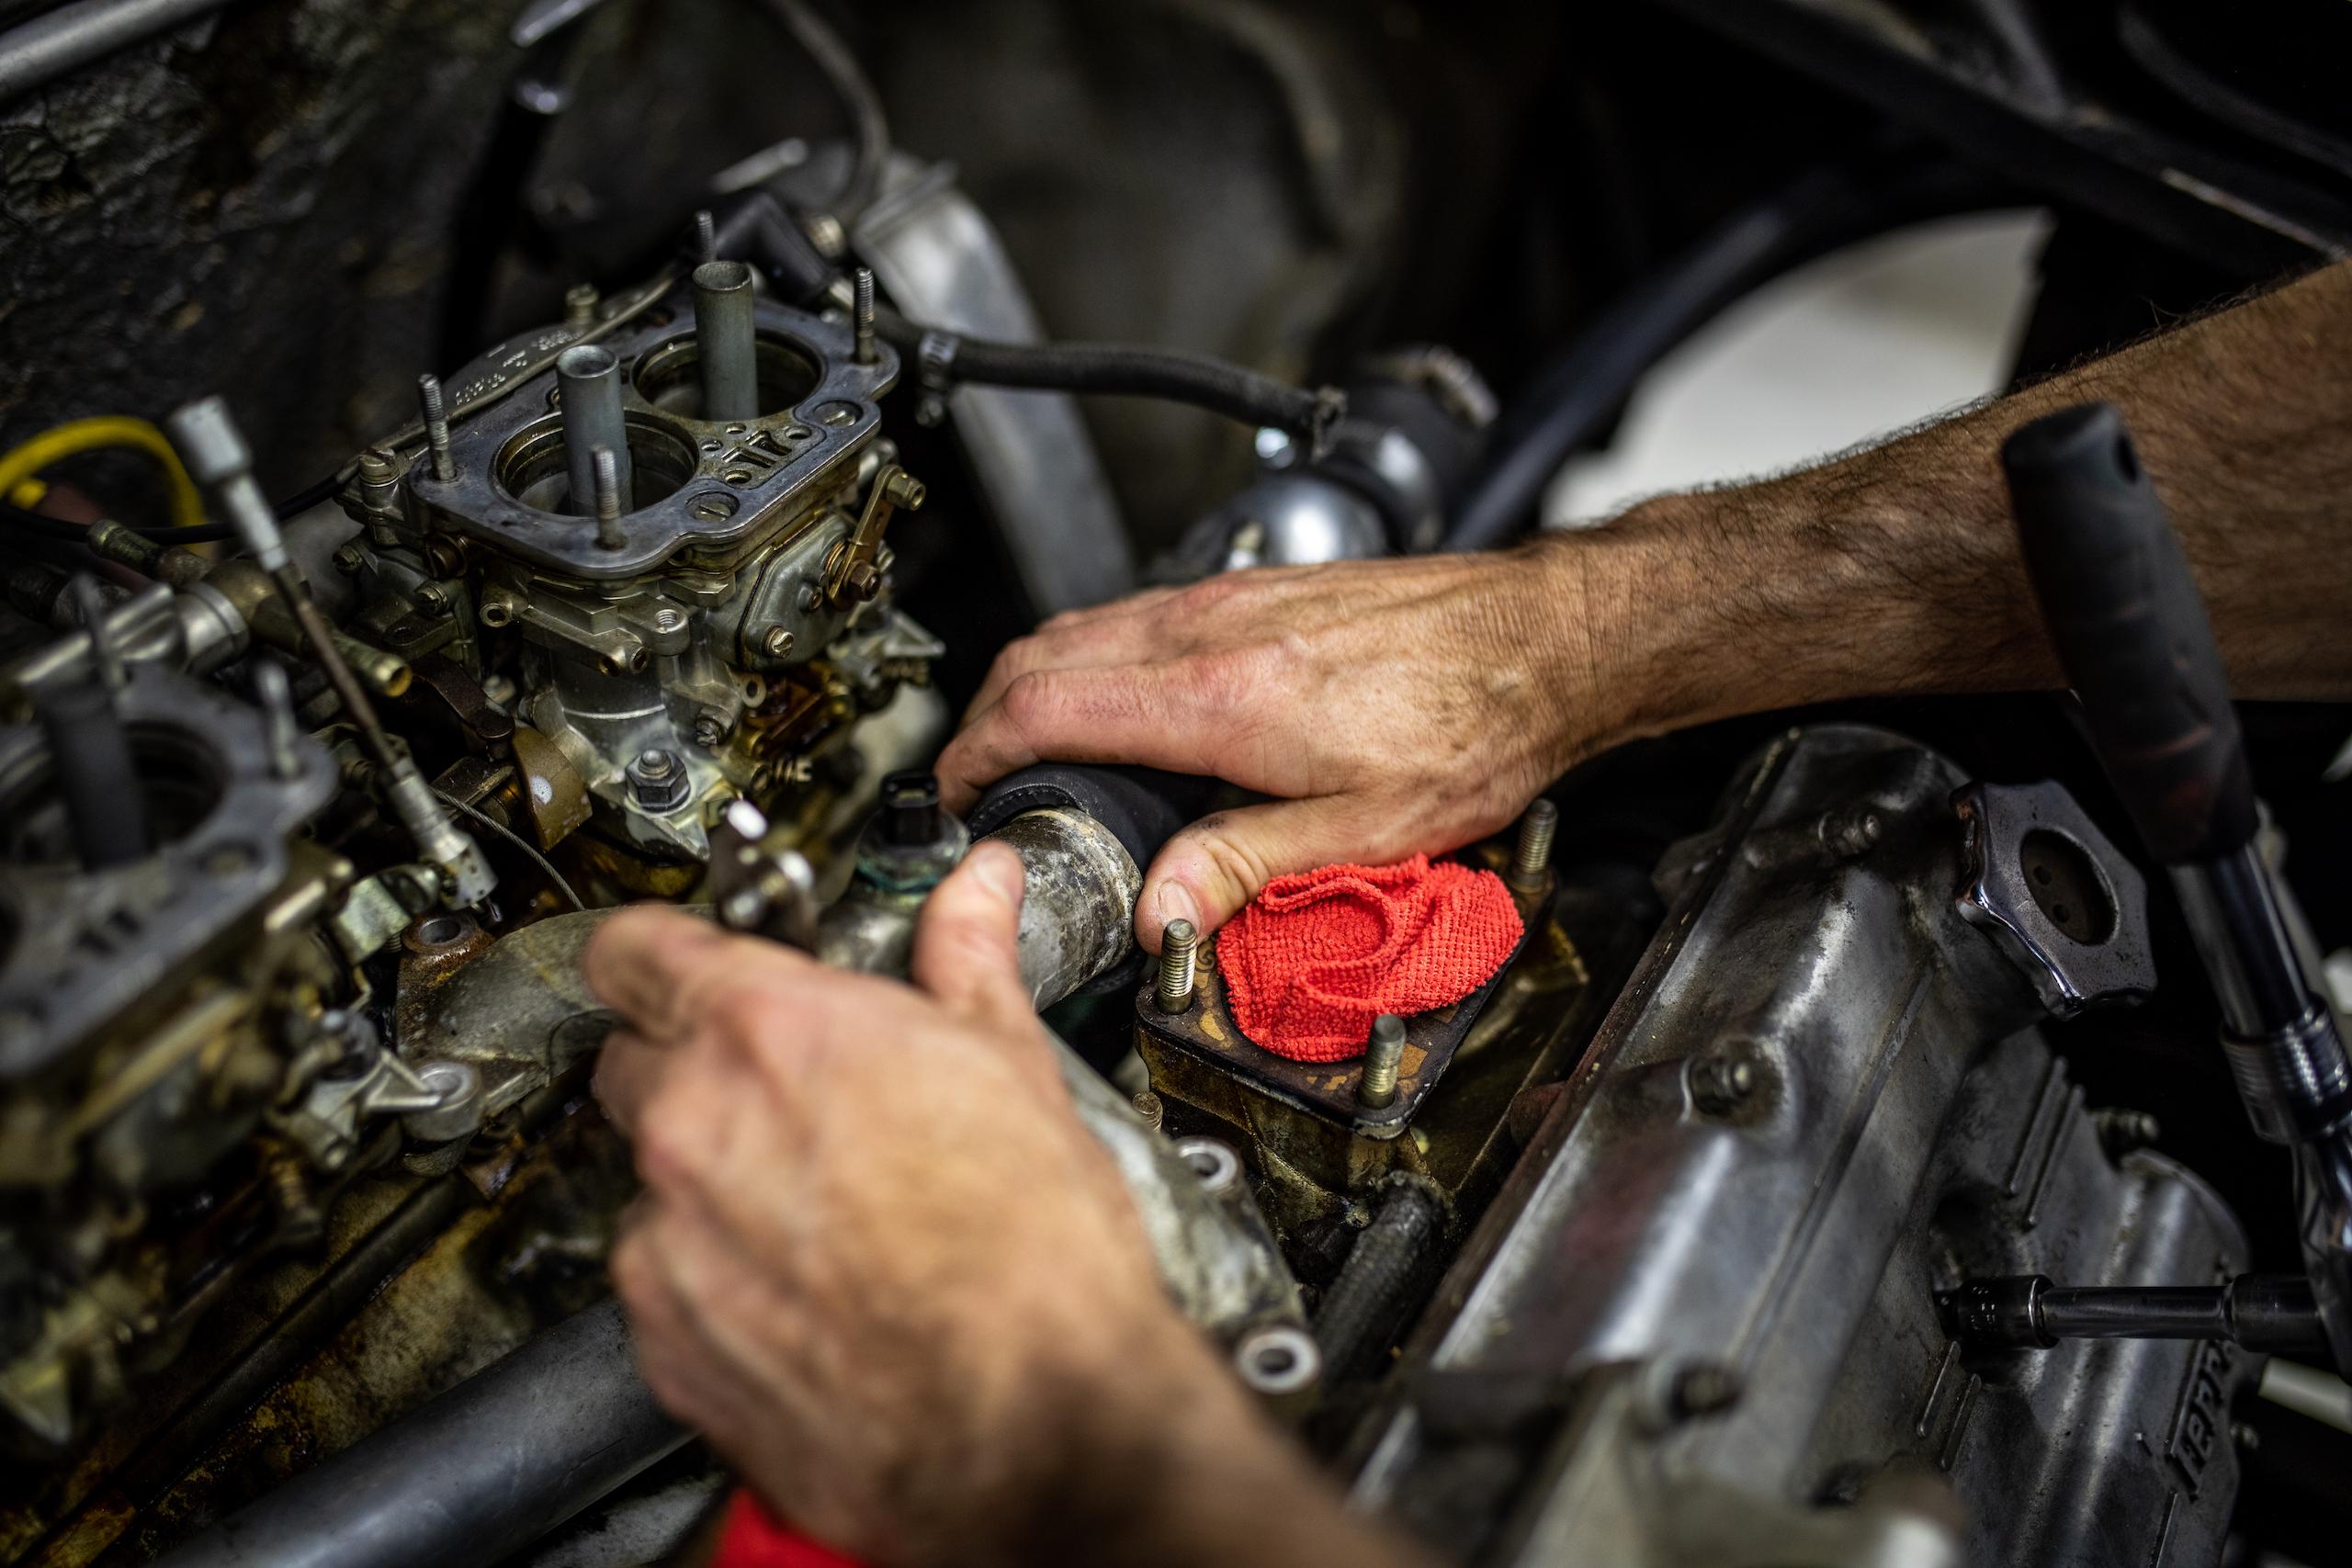 Ferrari Dino engine hands working close